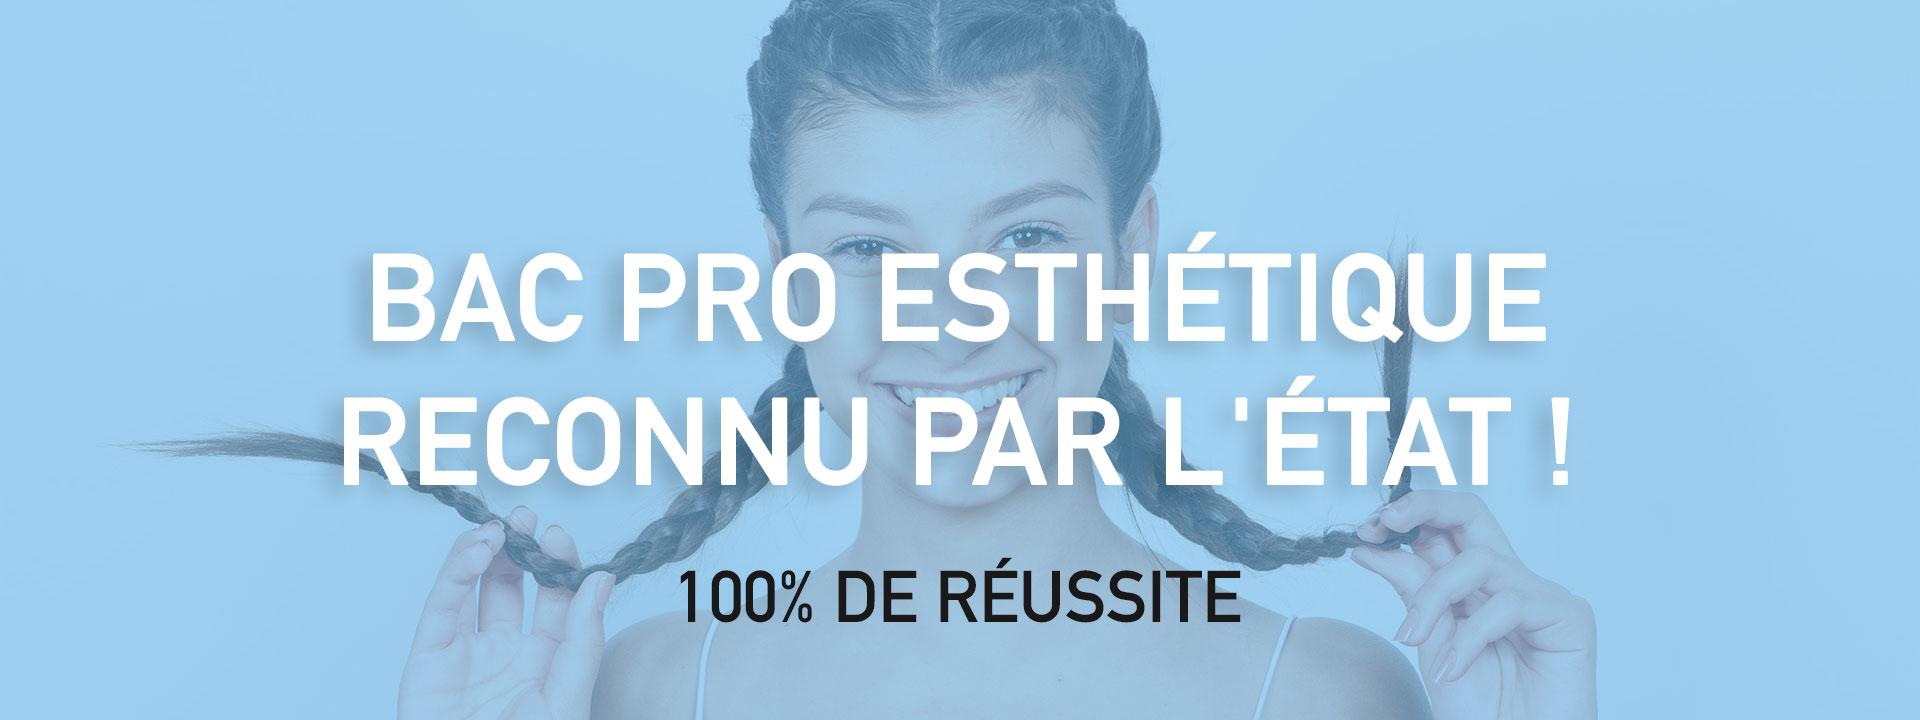 Bac Pro Boursier